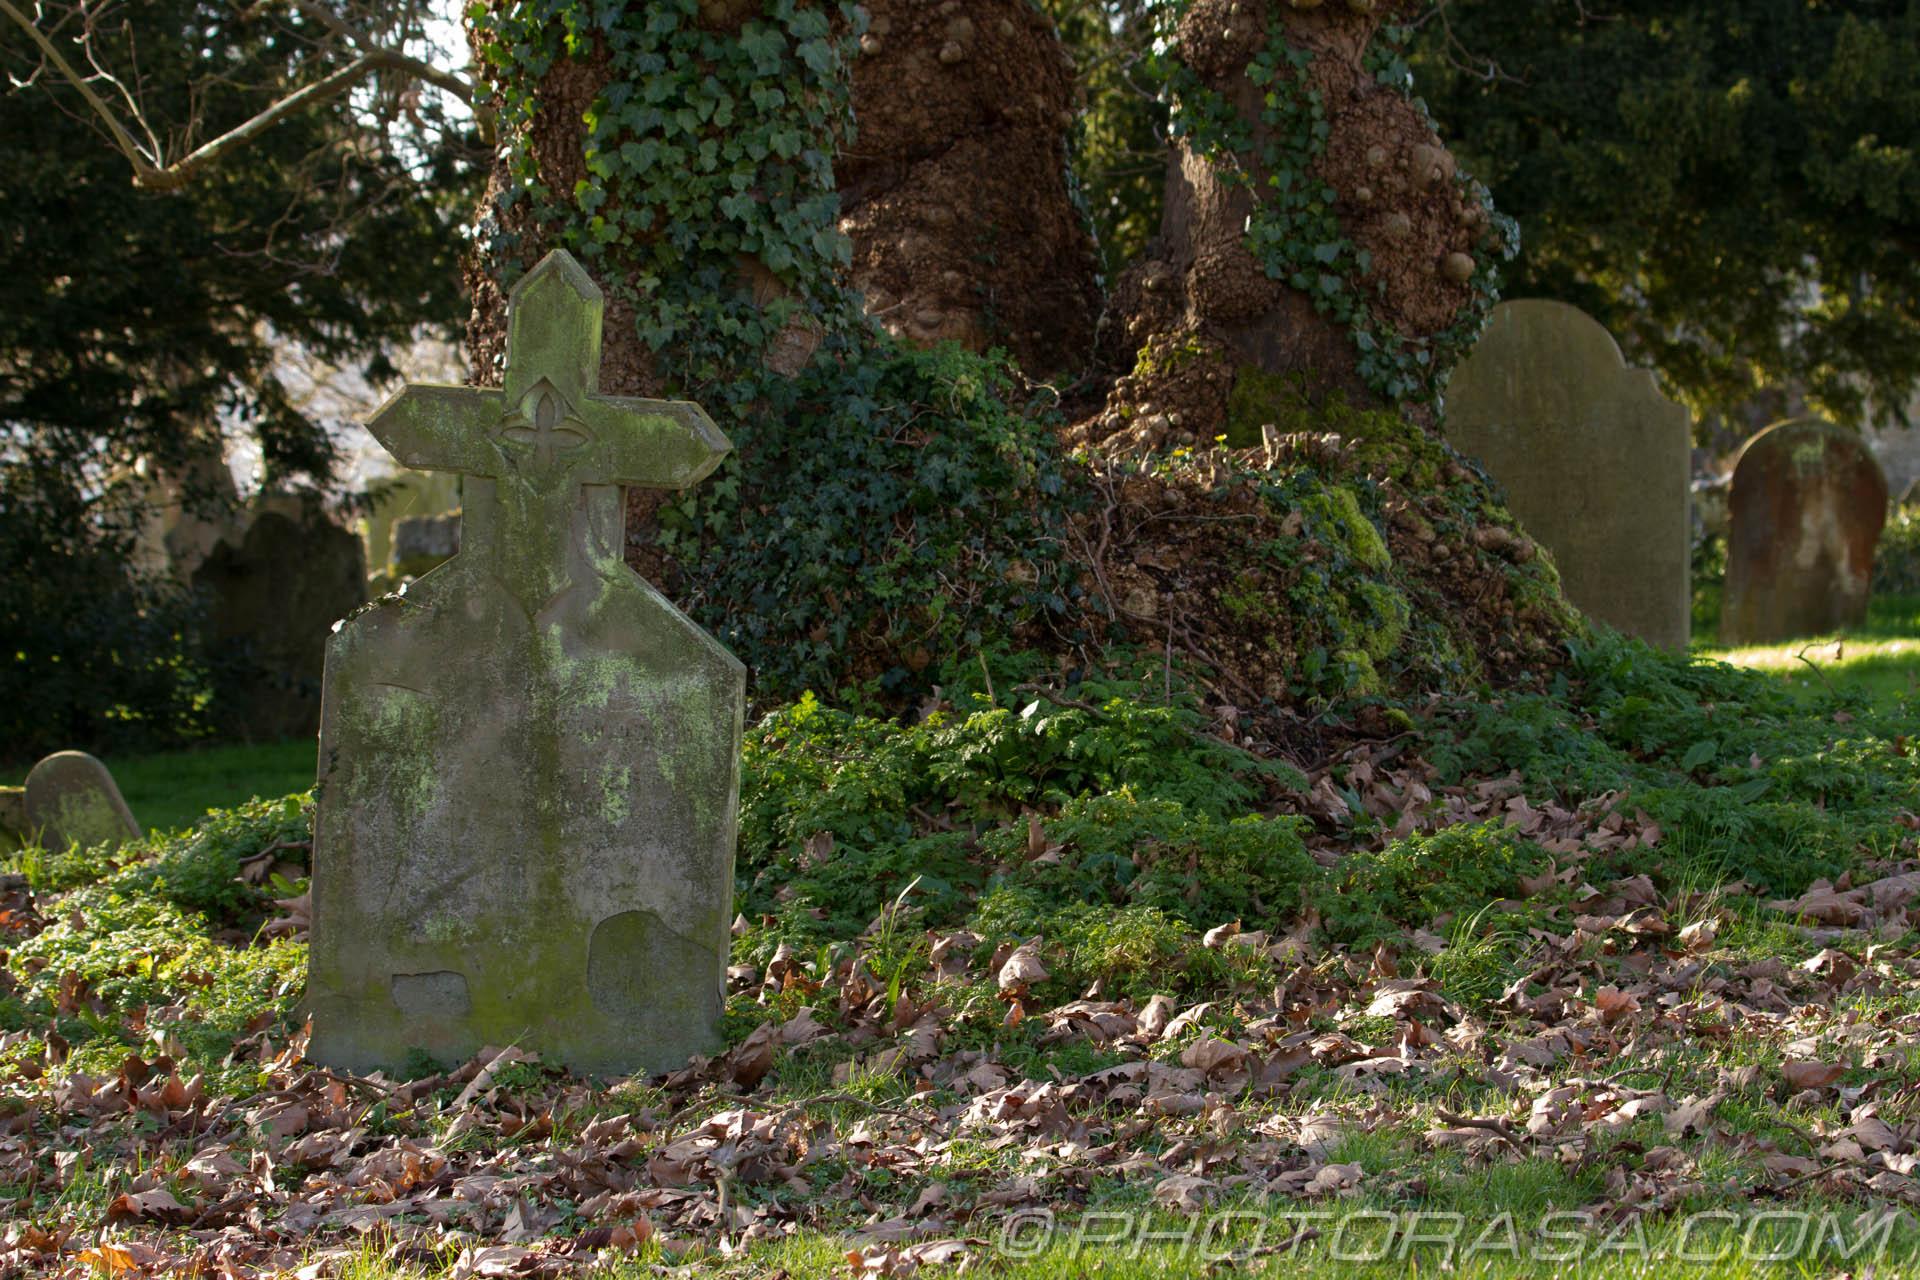 http://photorasa.com/parish-church-st-peter-st-paul-headcorn/grave-with-cross-shape-next-to-london-plain-tree/